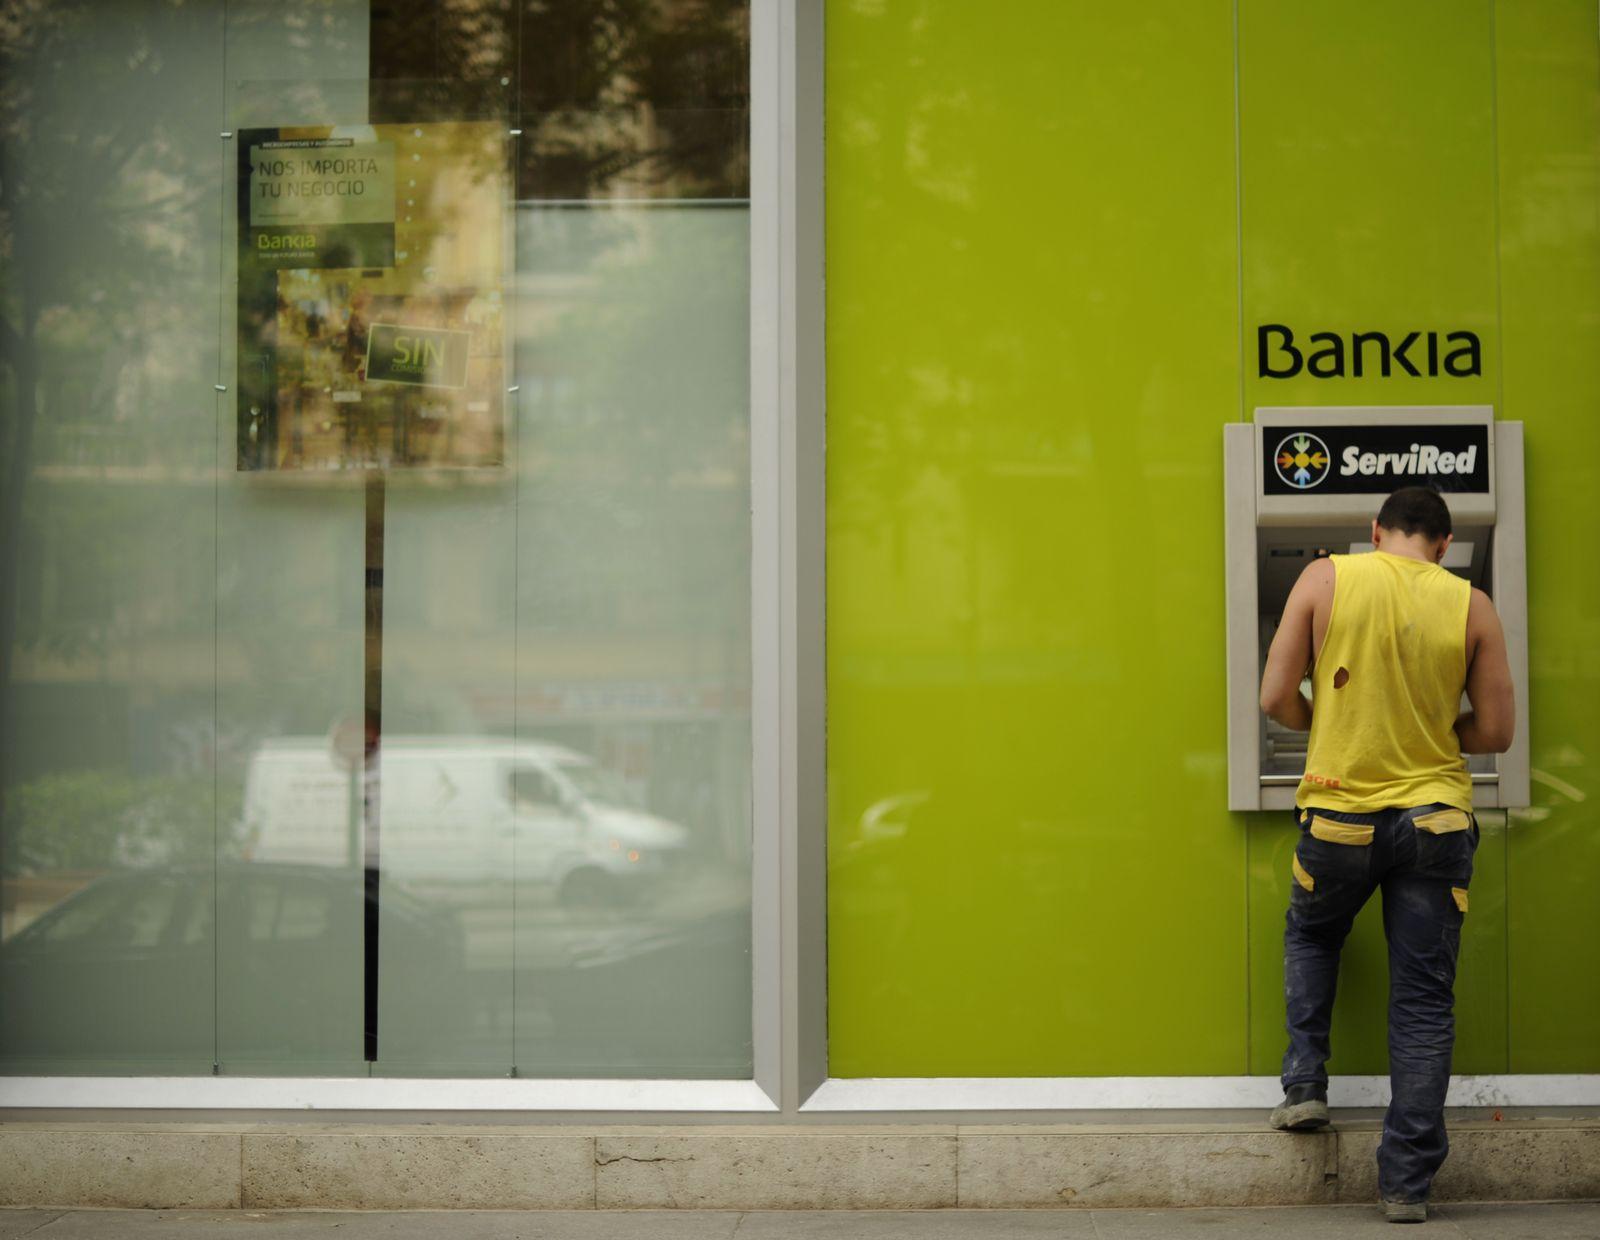 SPAIN-EUROPE-BANKING-BANKIA